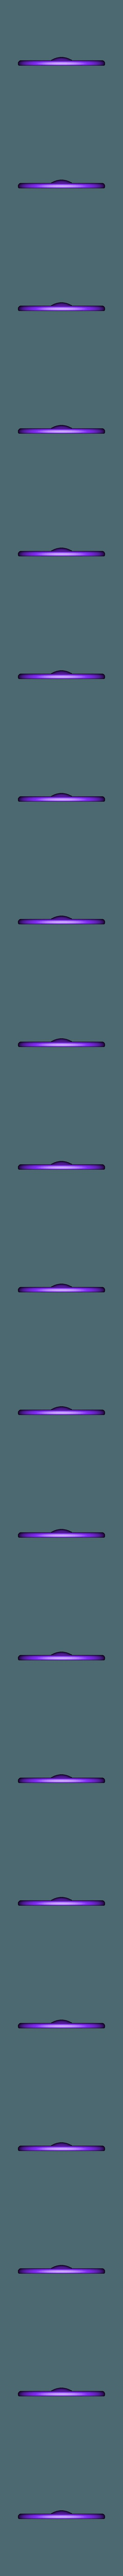 16STR-WHL.stl Download STL file Ratrod Pickup • 3D printing template, macone1